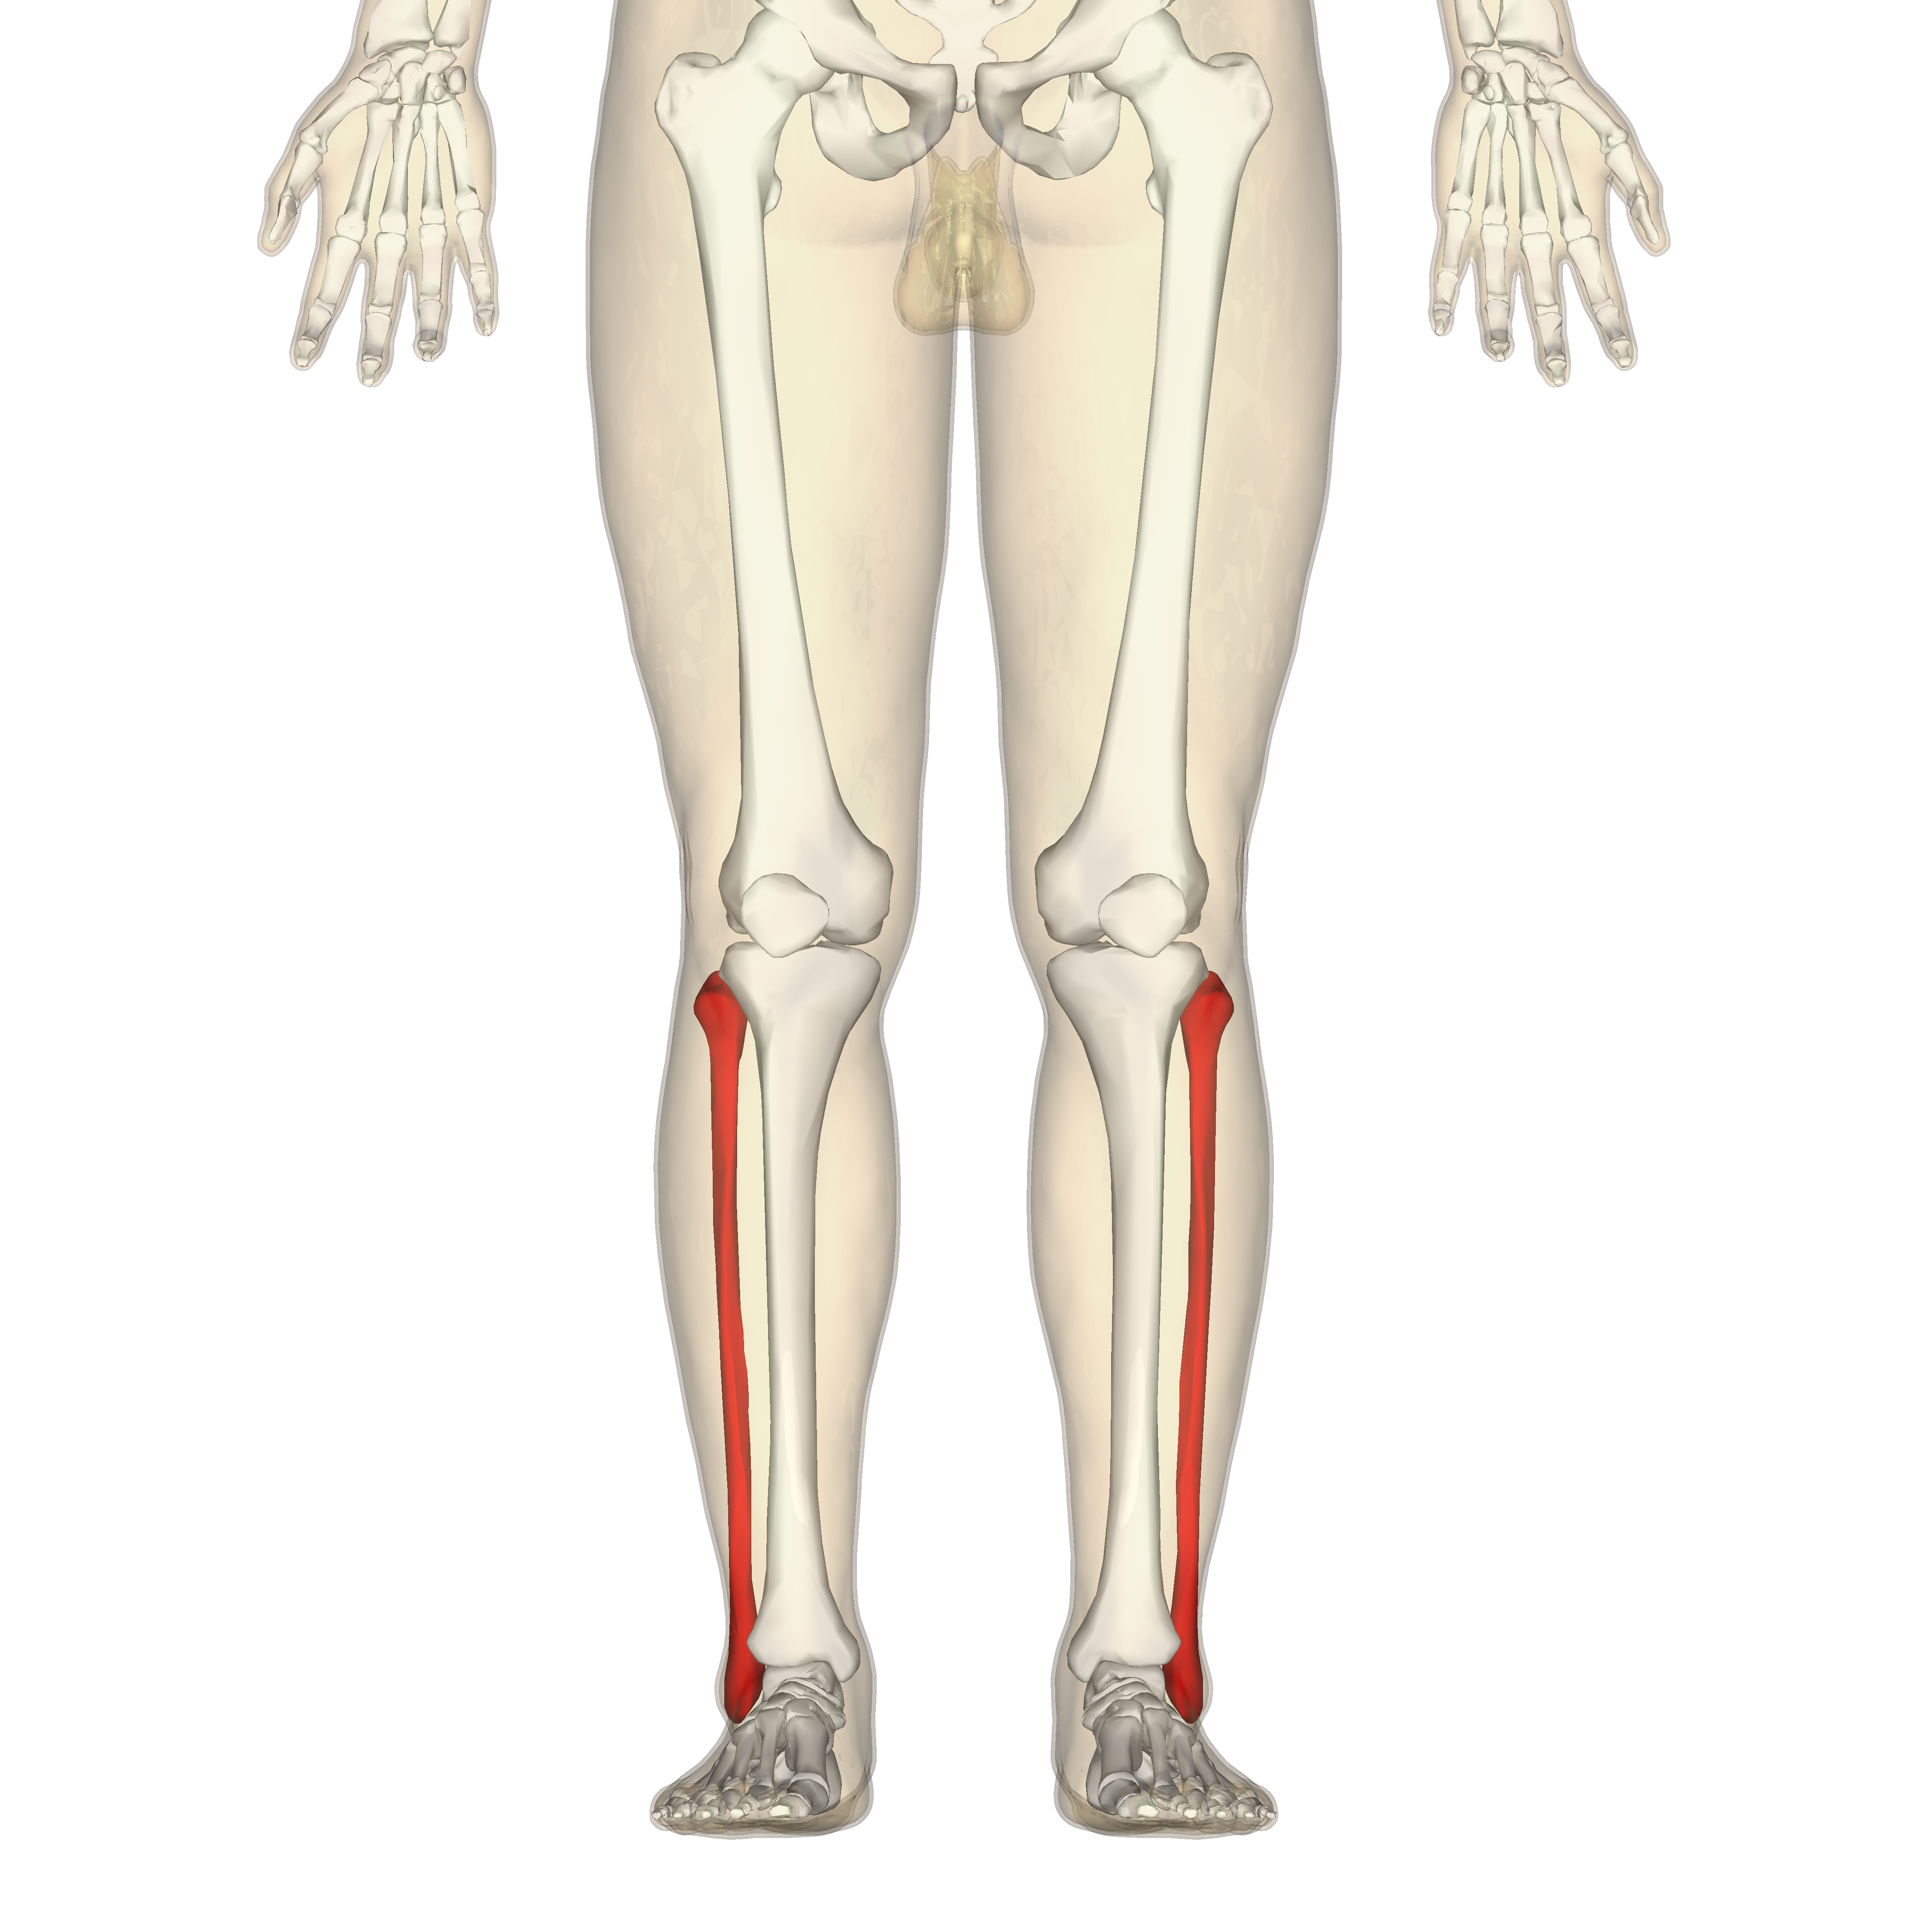 Human Femur Position of fibula in human